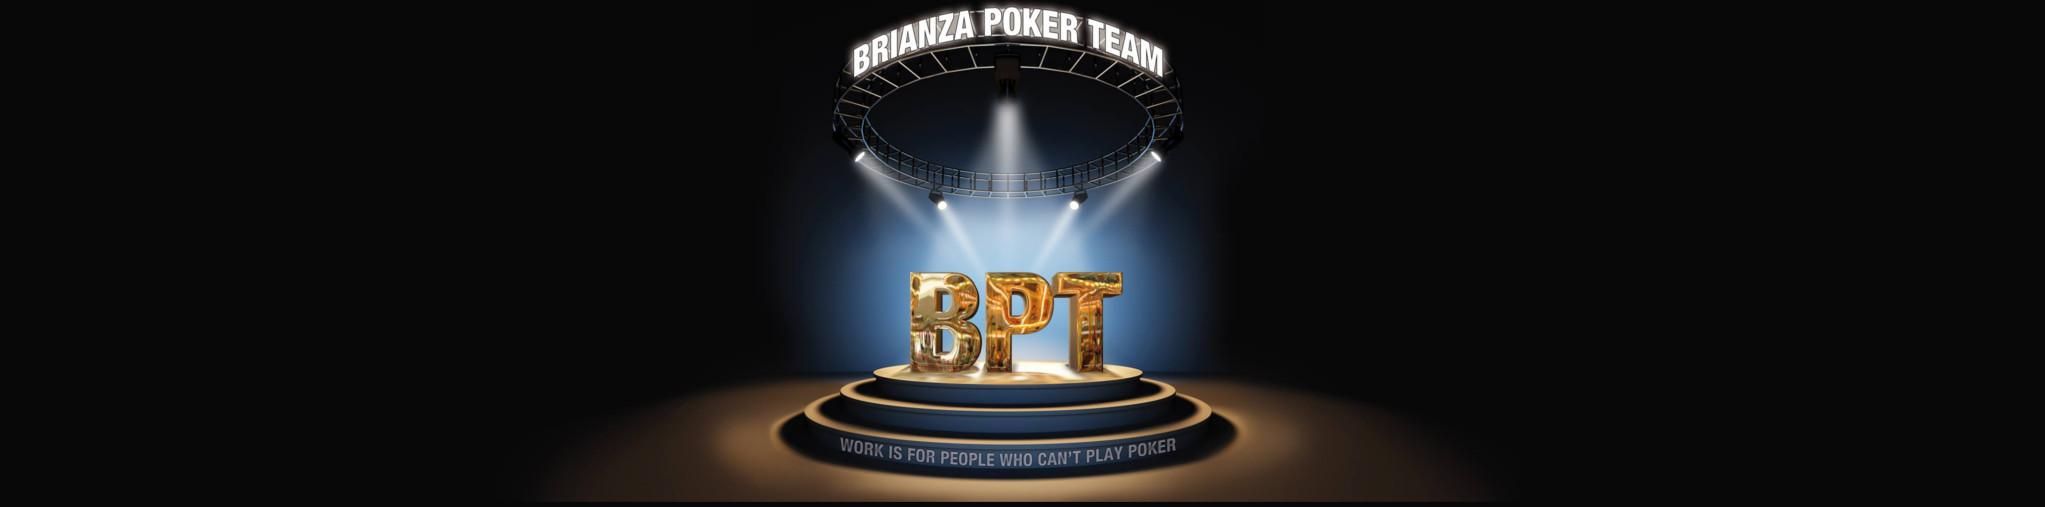 BPT – Brianza Poker